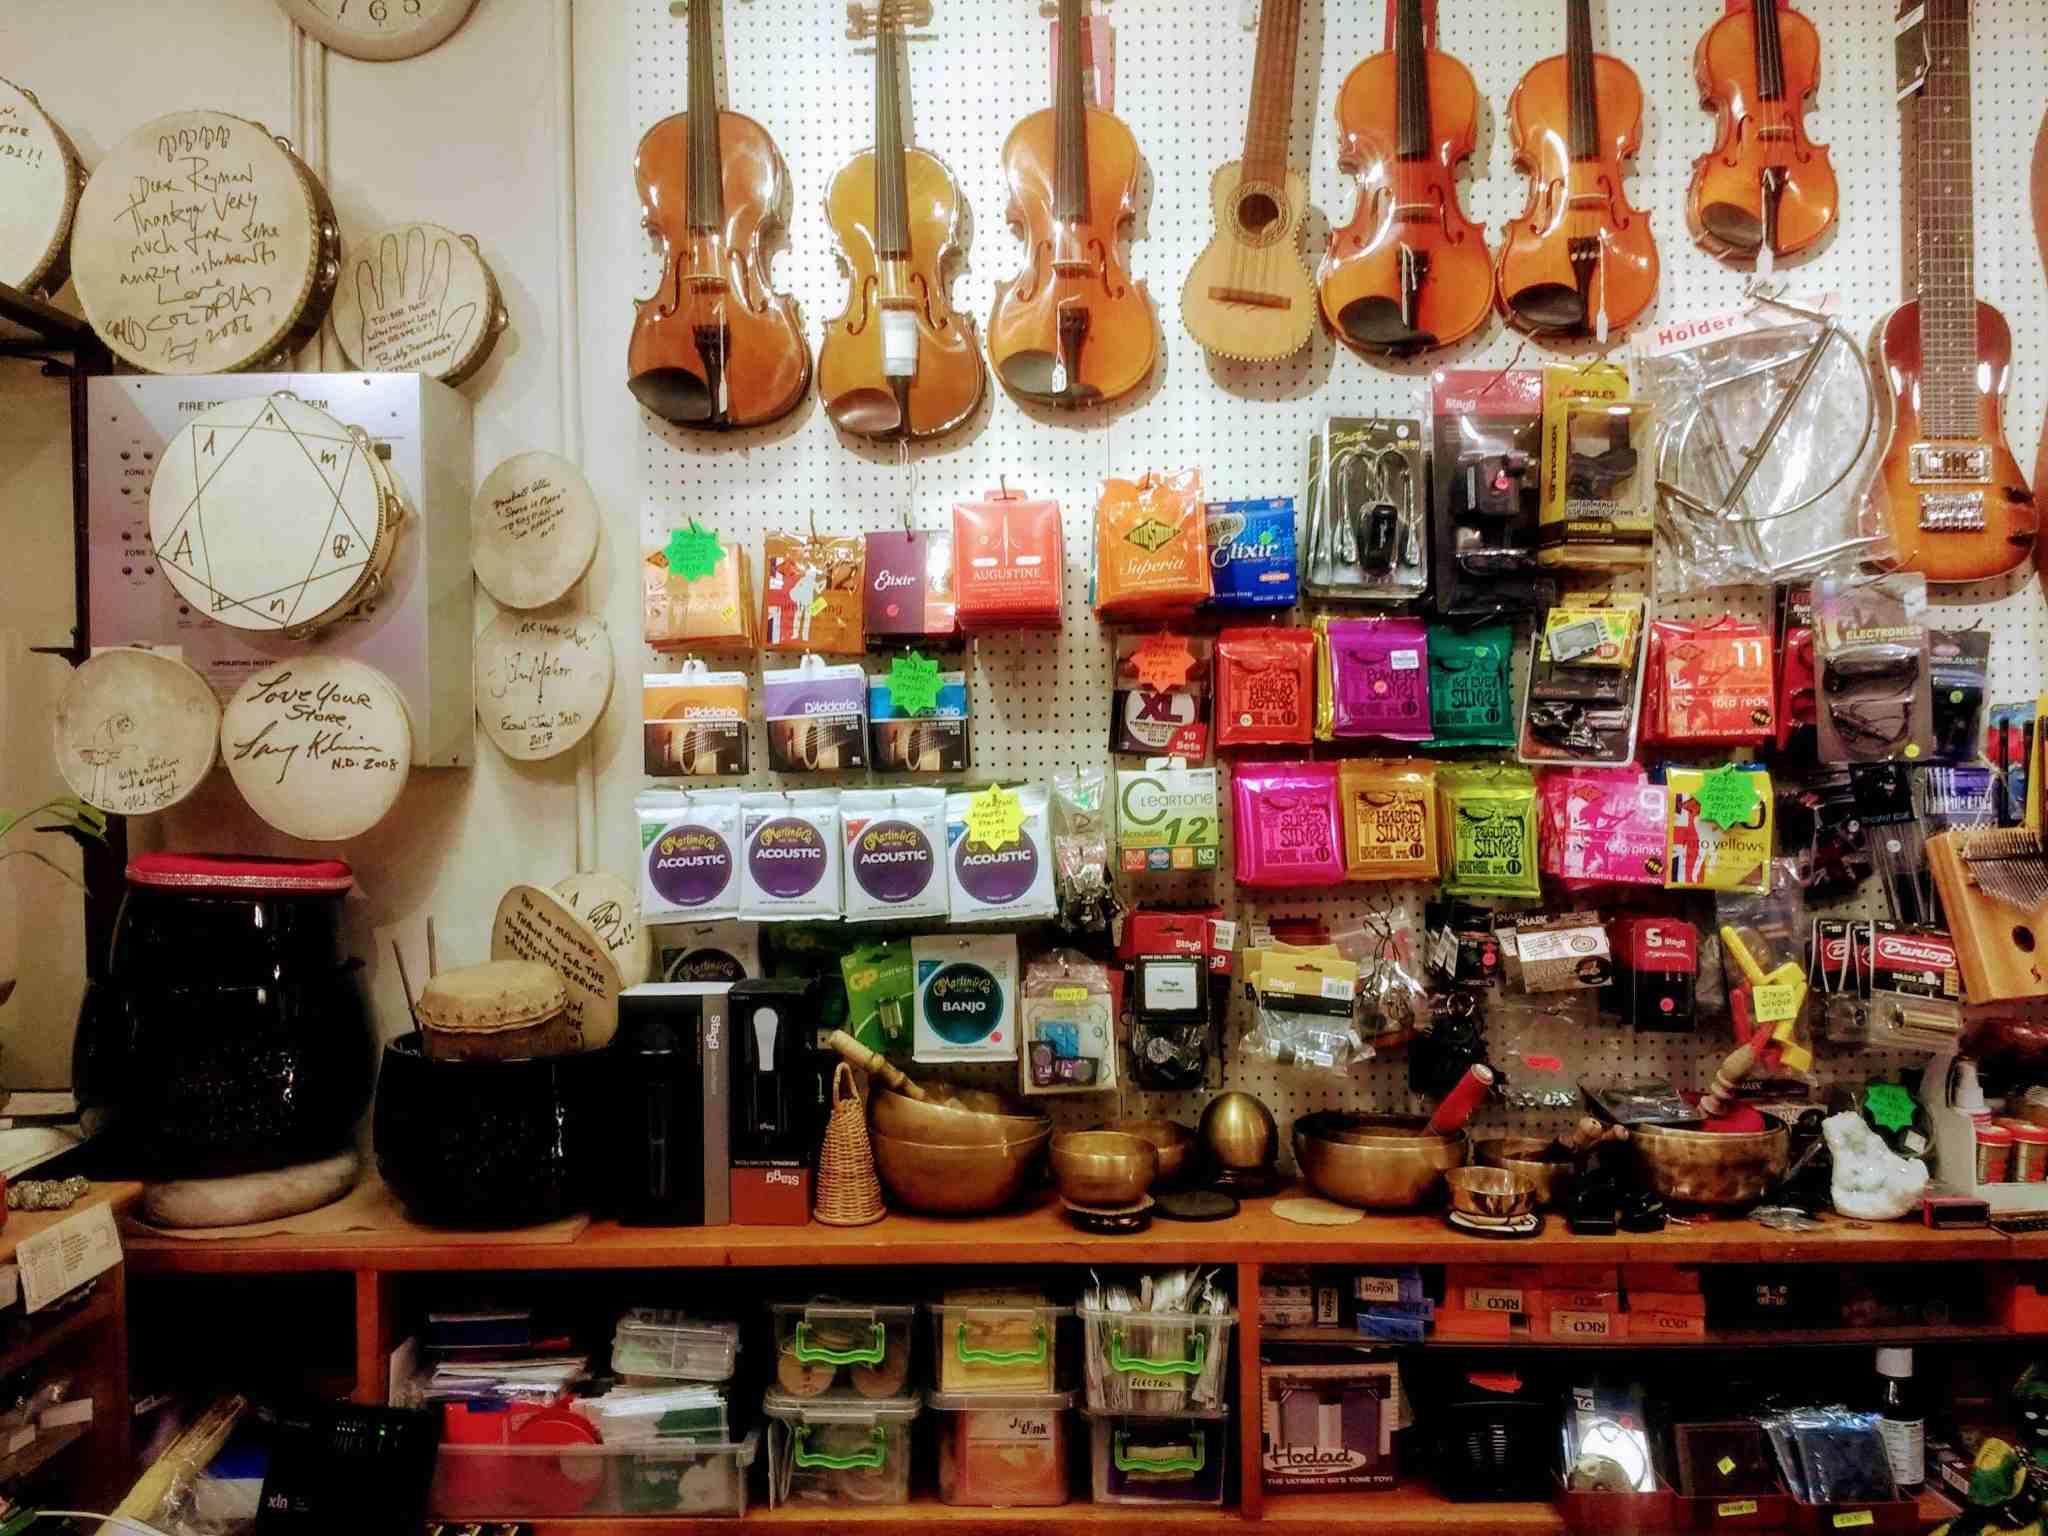 Ray Man's shop violins